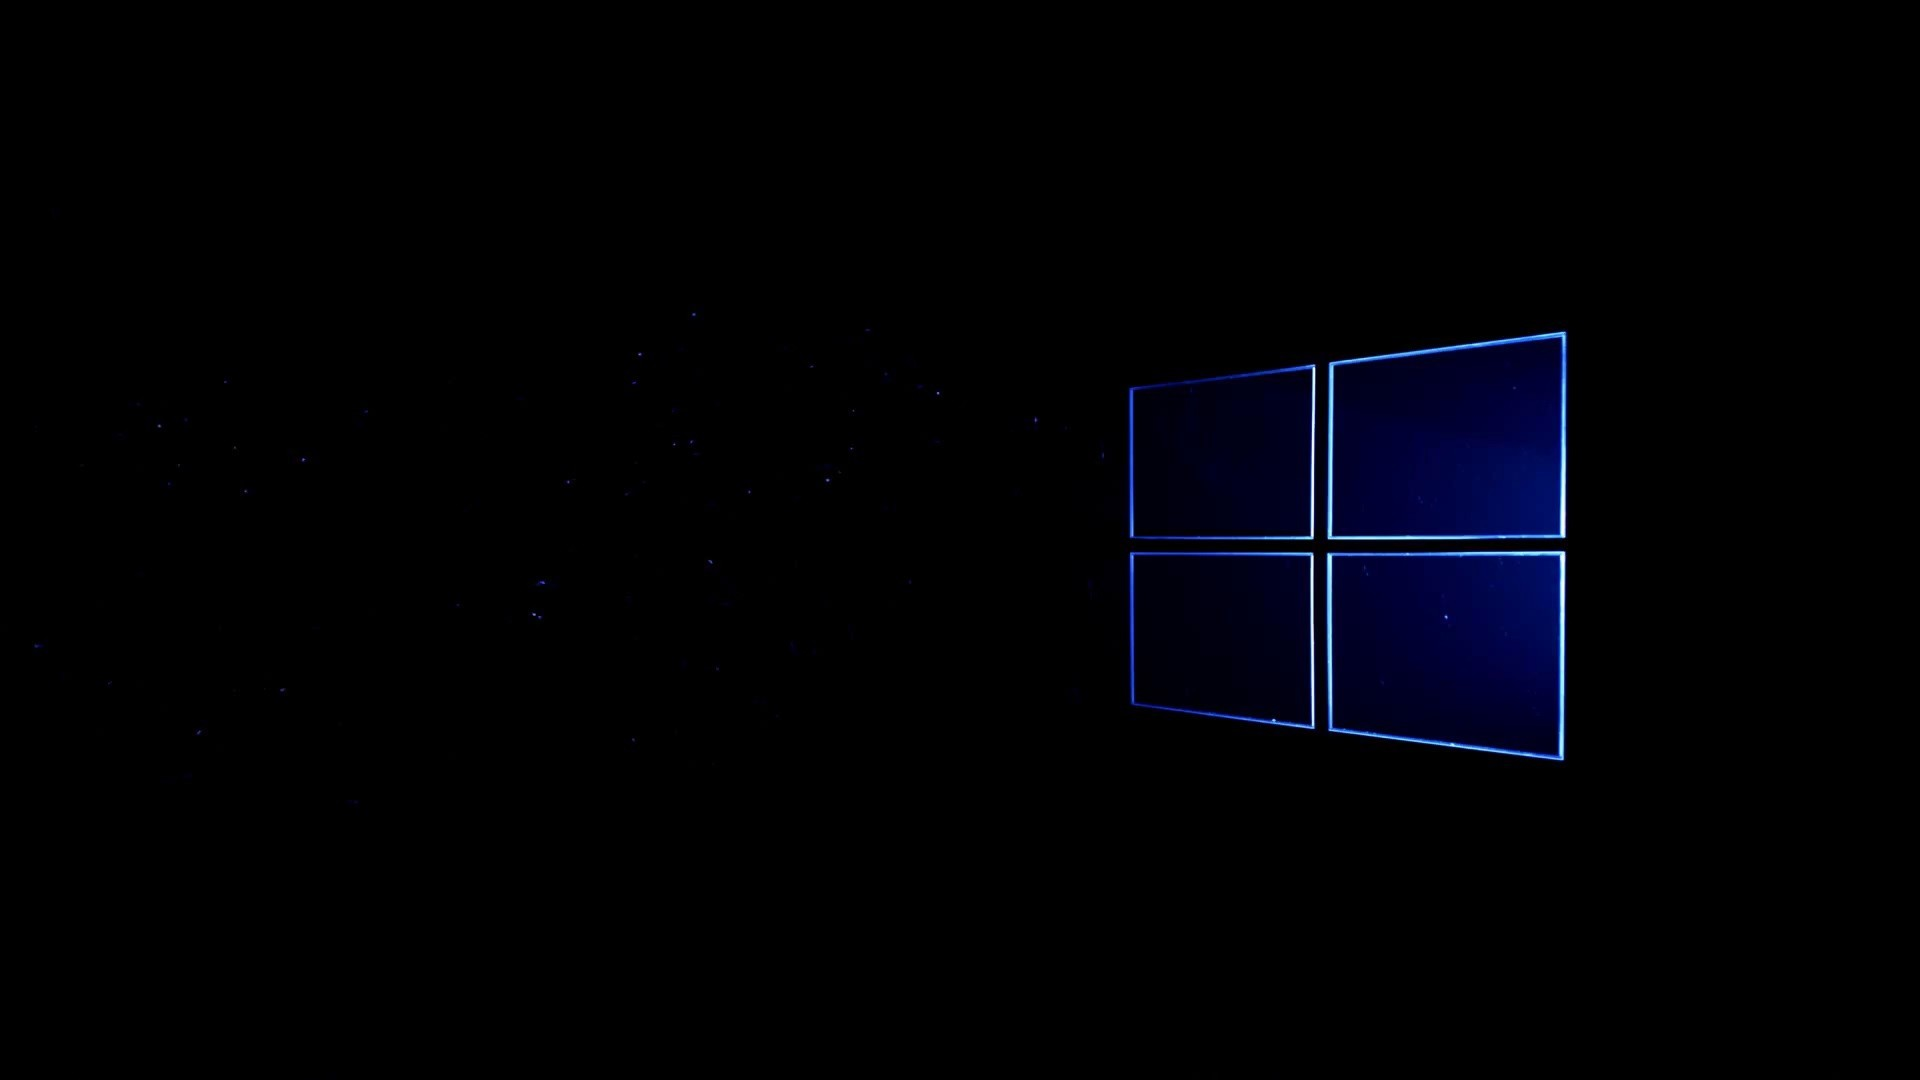 windows 10 wallpaper hd 1920x1080 free download